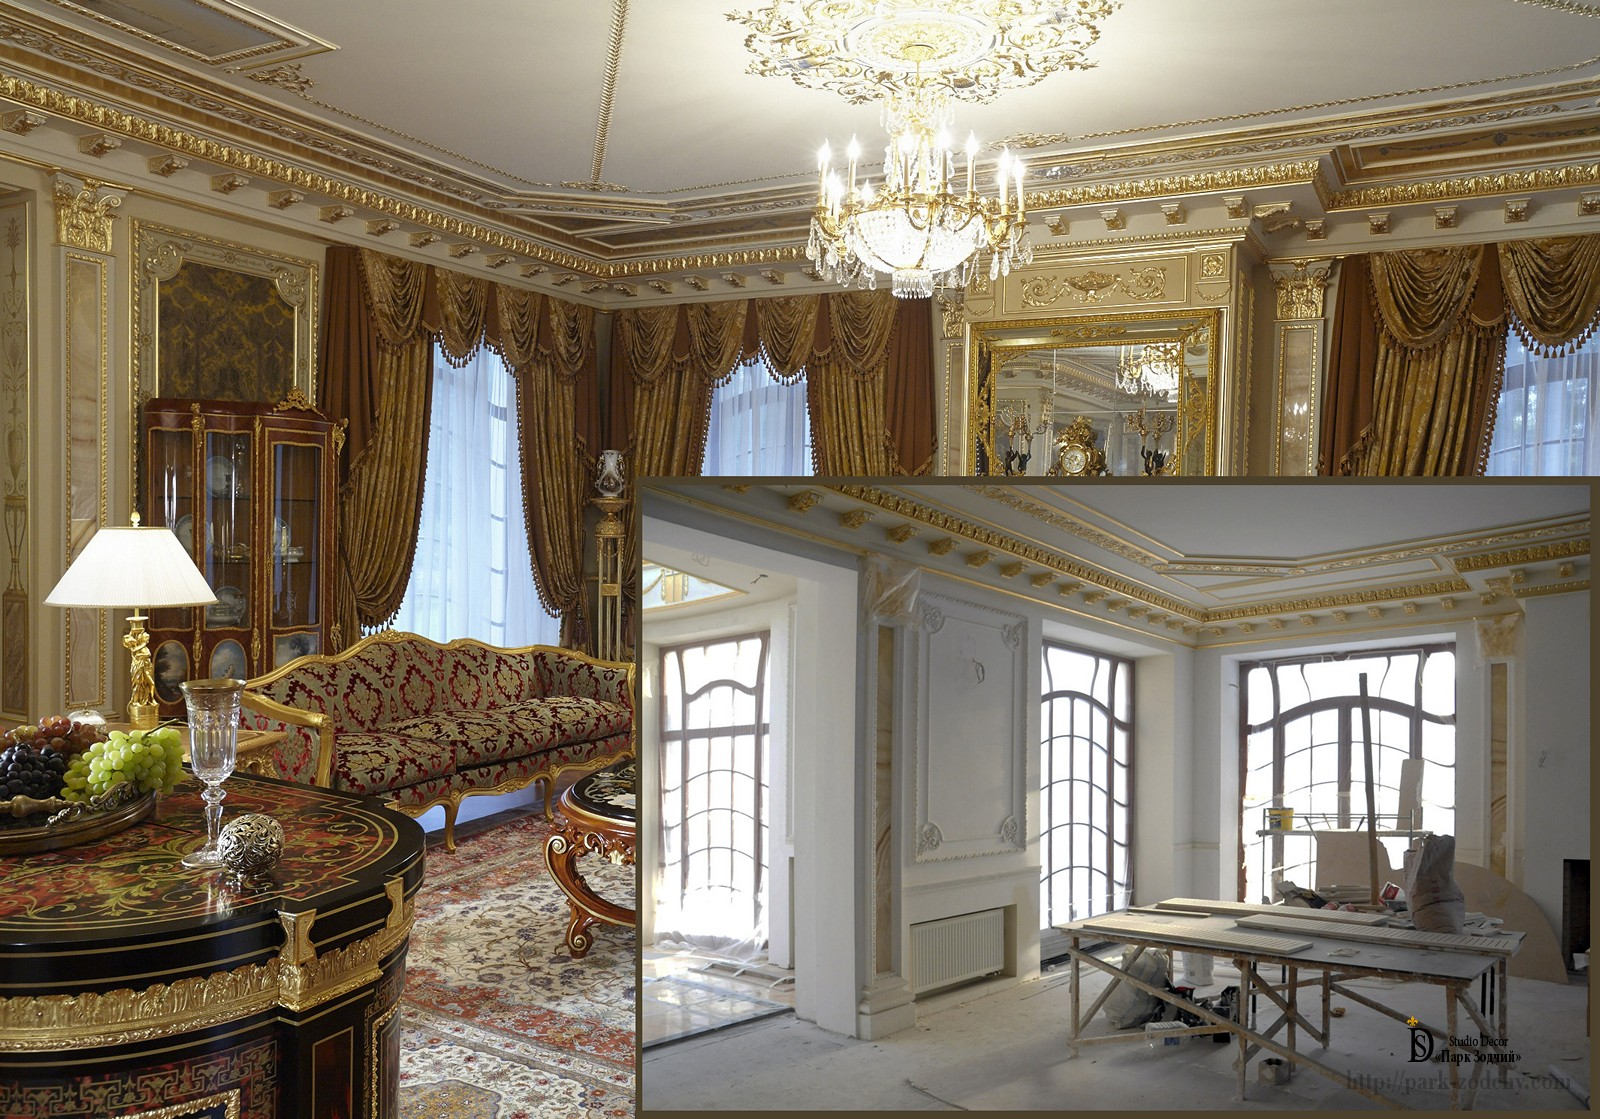 Elite interior design studio decor park zodchy for Elite interior designs